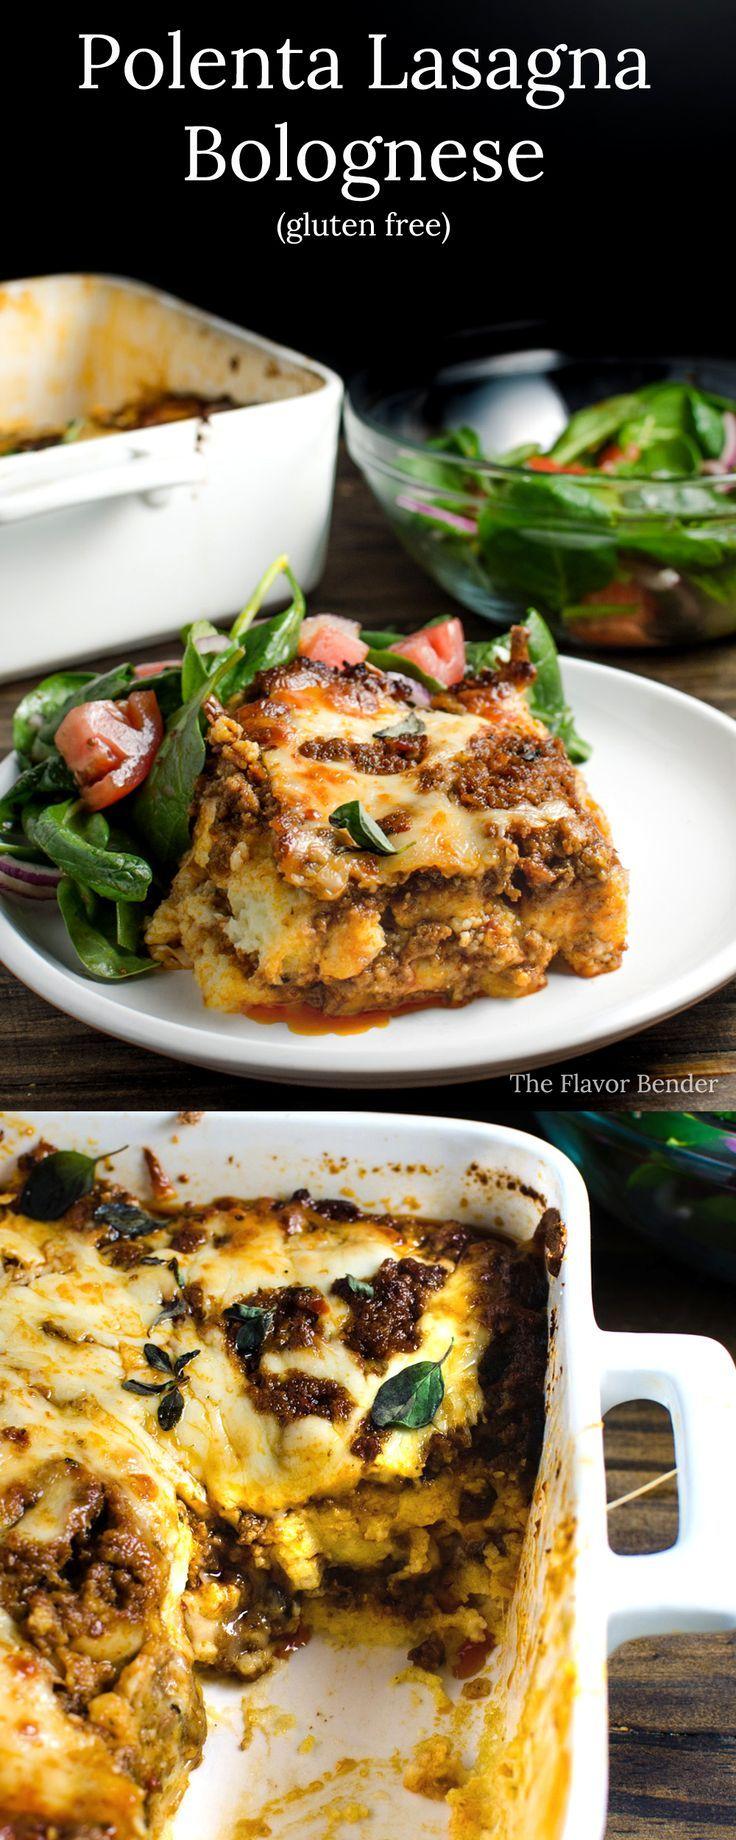 Polenta Lasagna Bolognese -  A twist on the classic lasagna. Delicious and creamy comfort food!